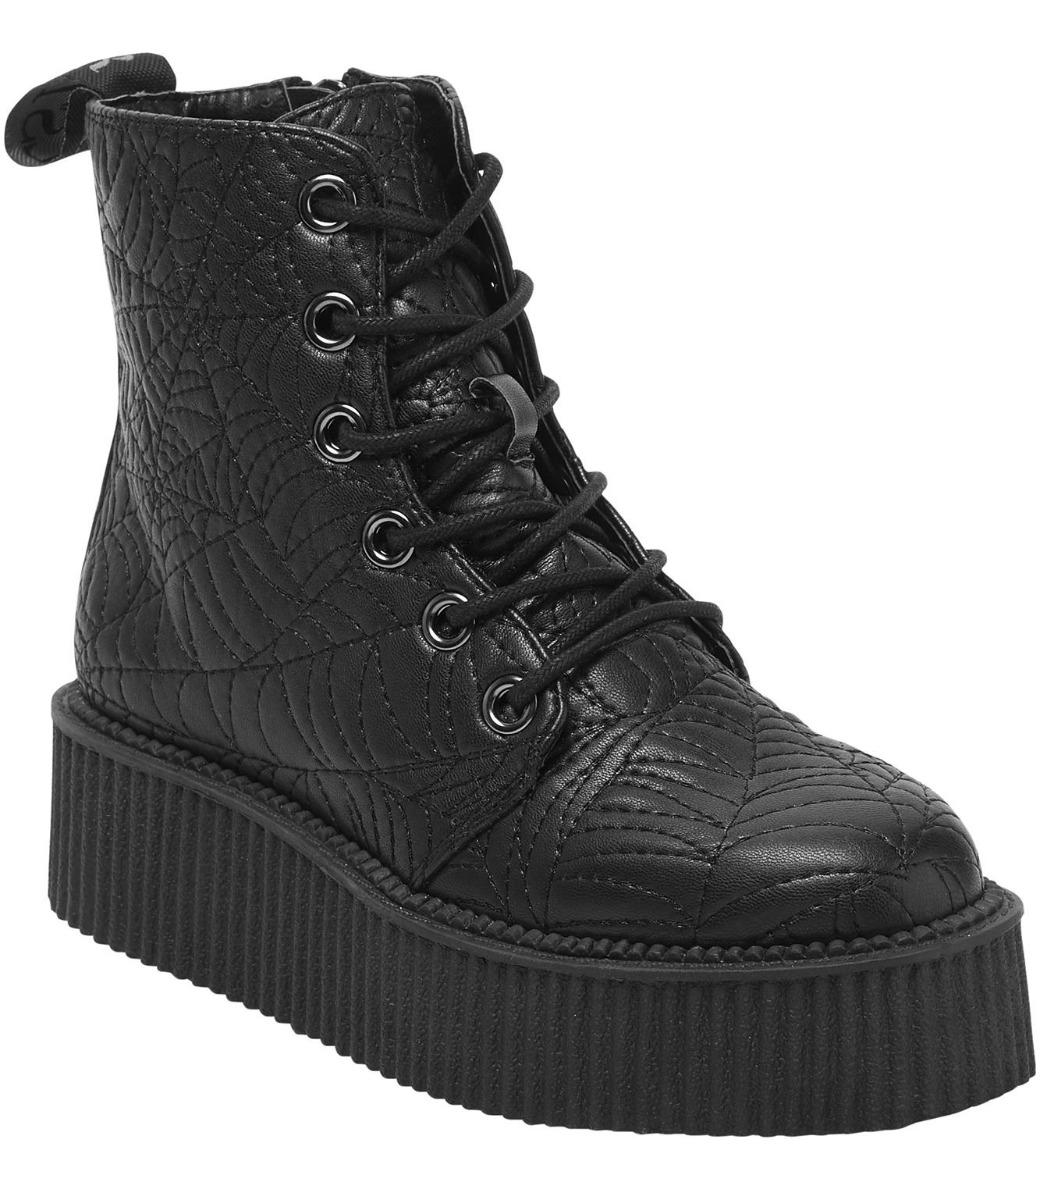 ks0848_chaussures-bottines-baskets-plateforme-gothique-glam-rock-coffin-creeper